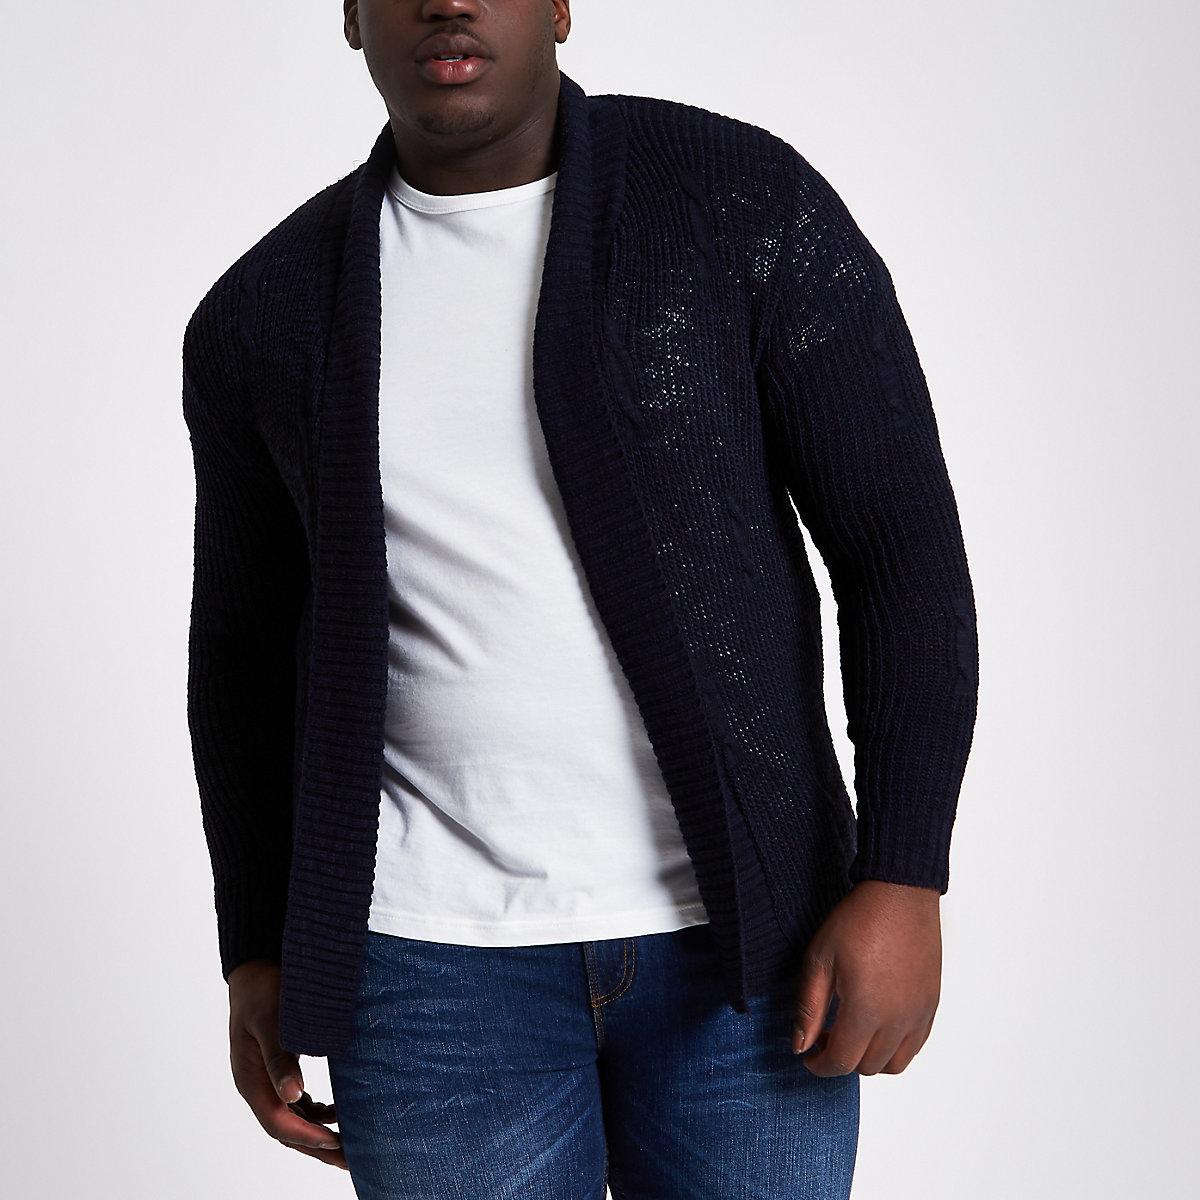 Big and Tall navy knit cardigan